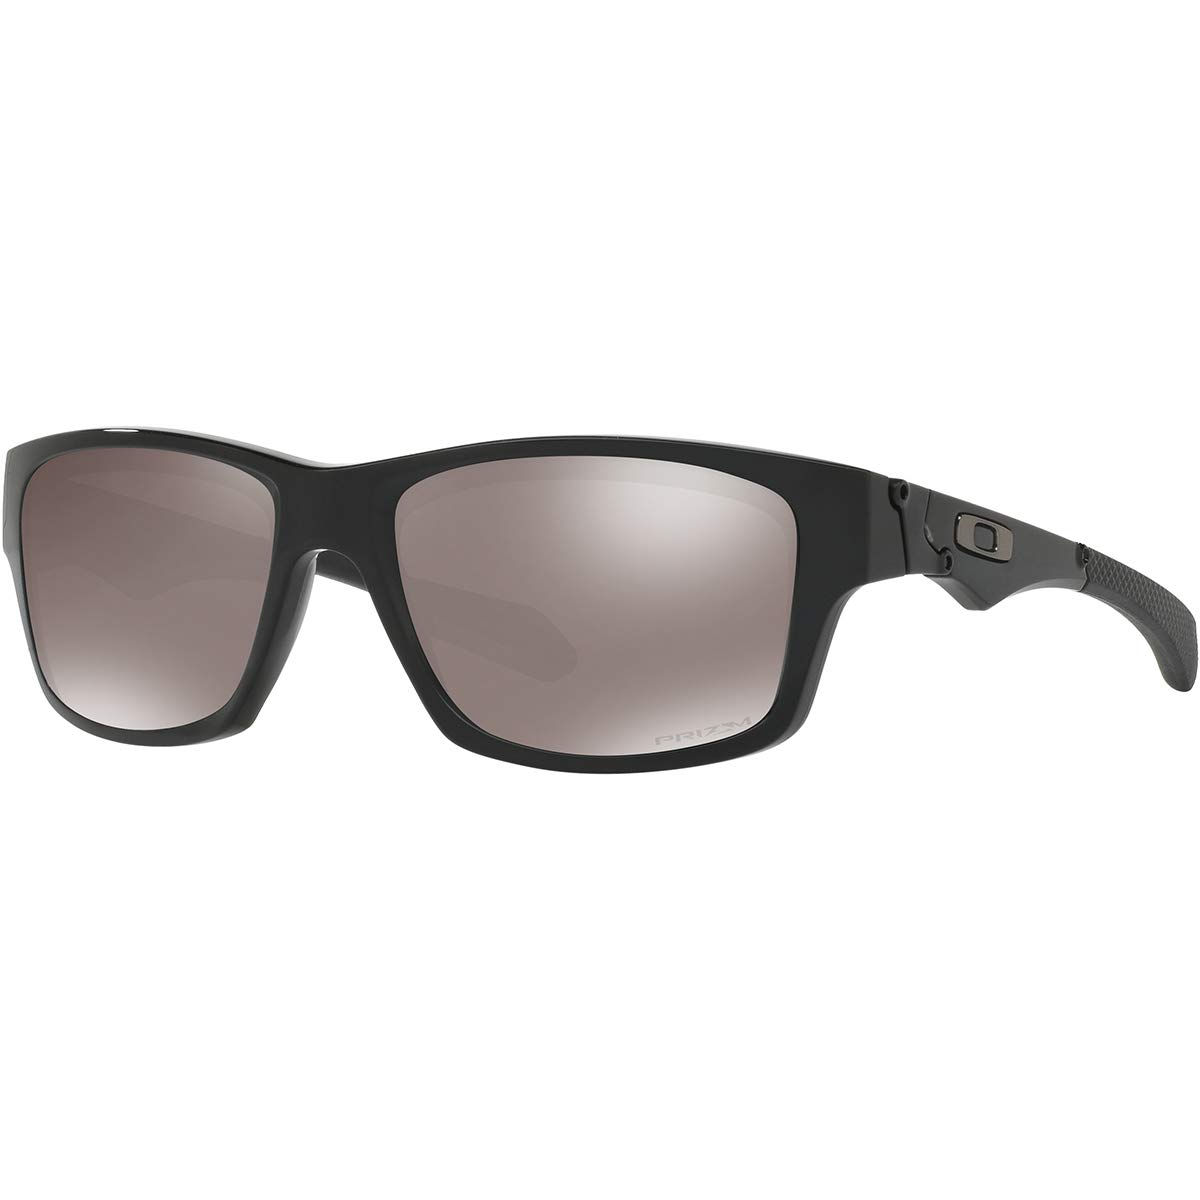 Oakley Men's OO9135 Jupiter Squared Rectangular Sunglasses, Polished Black/Prizm Black Polarized, 56 mm by Oakley